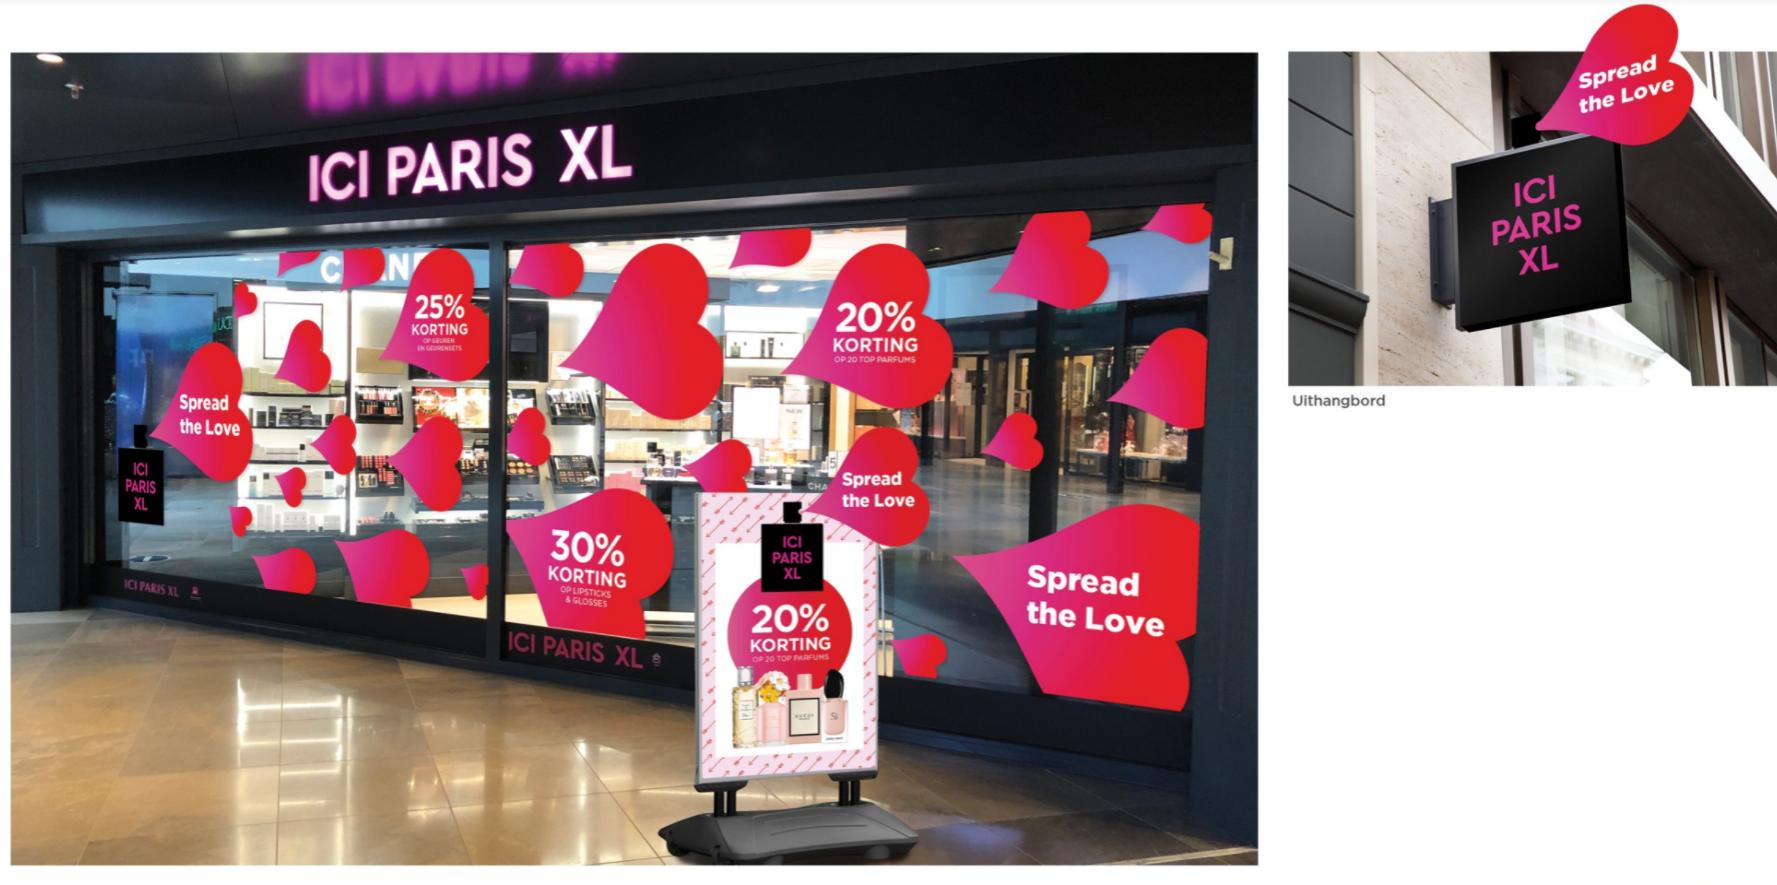 ICI Paris Store window